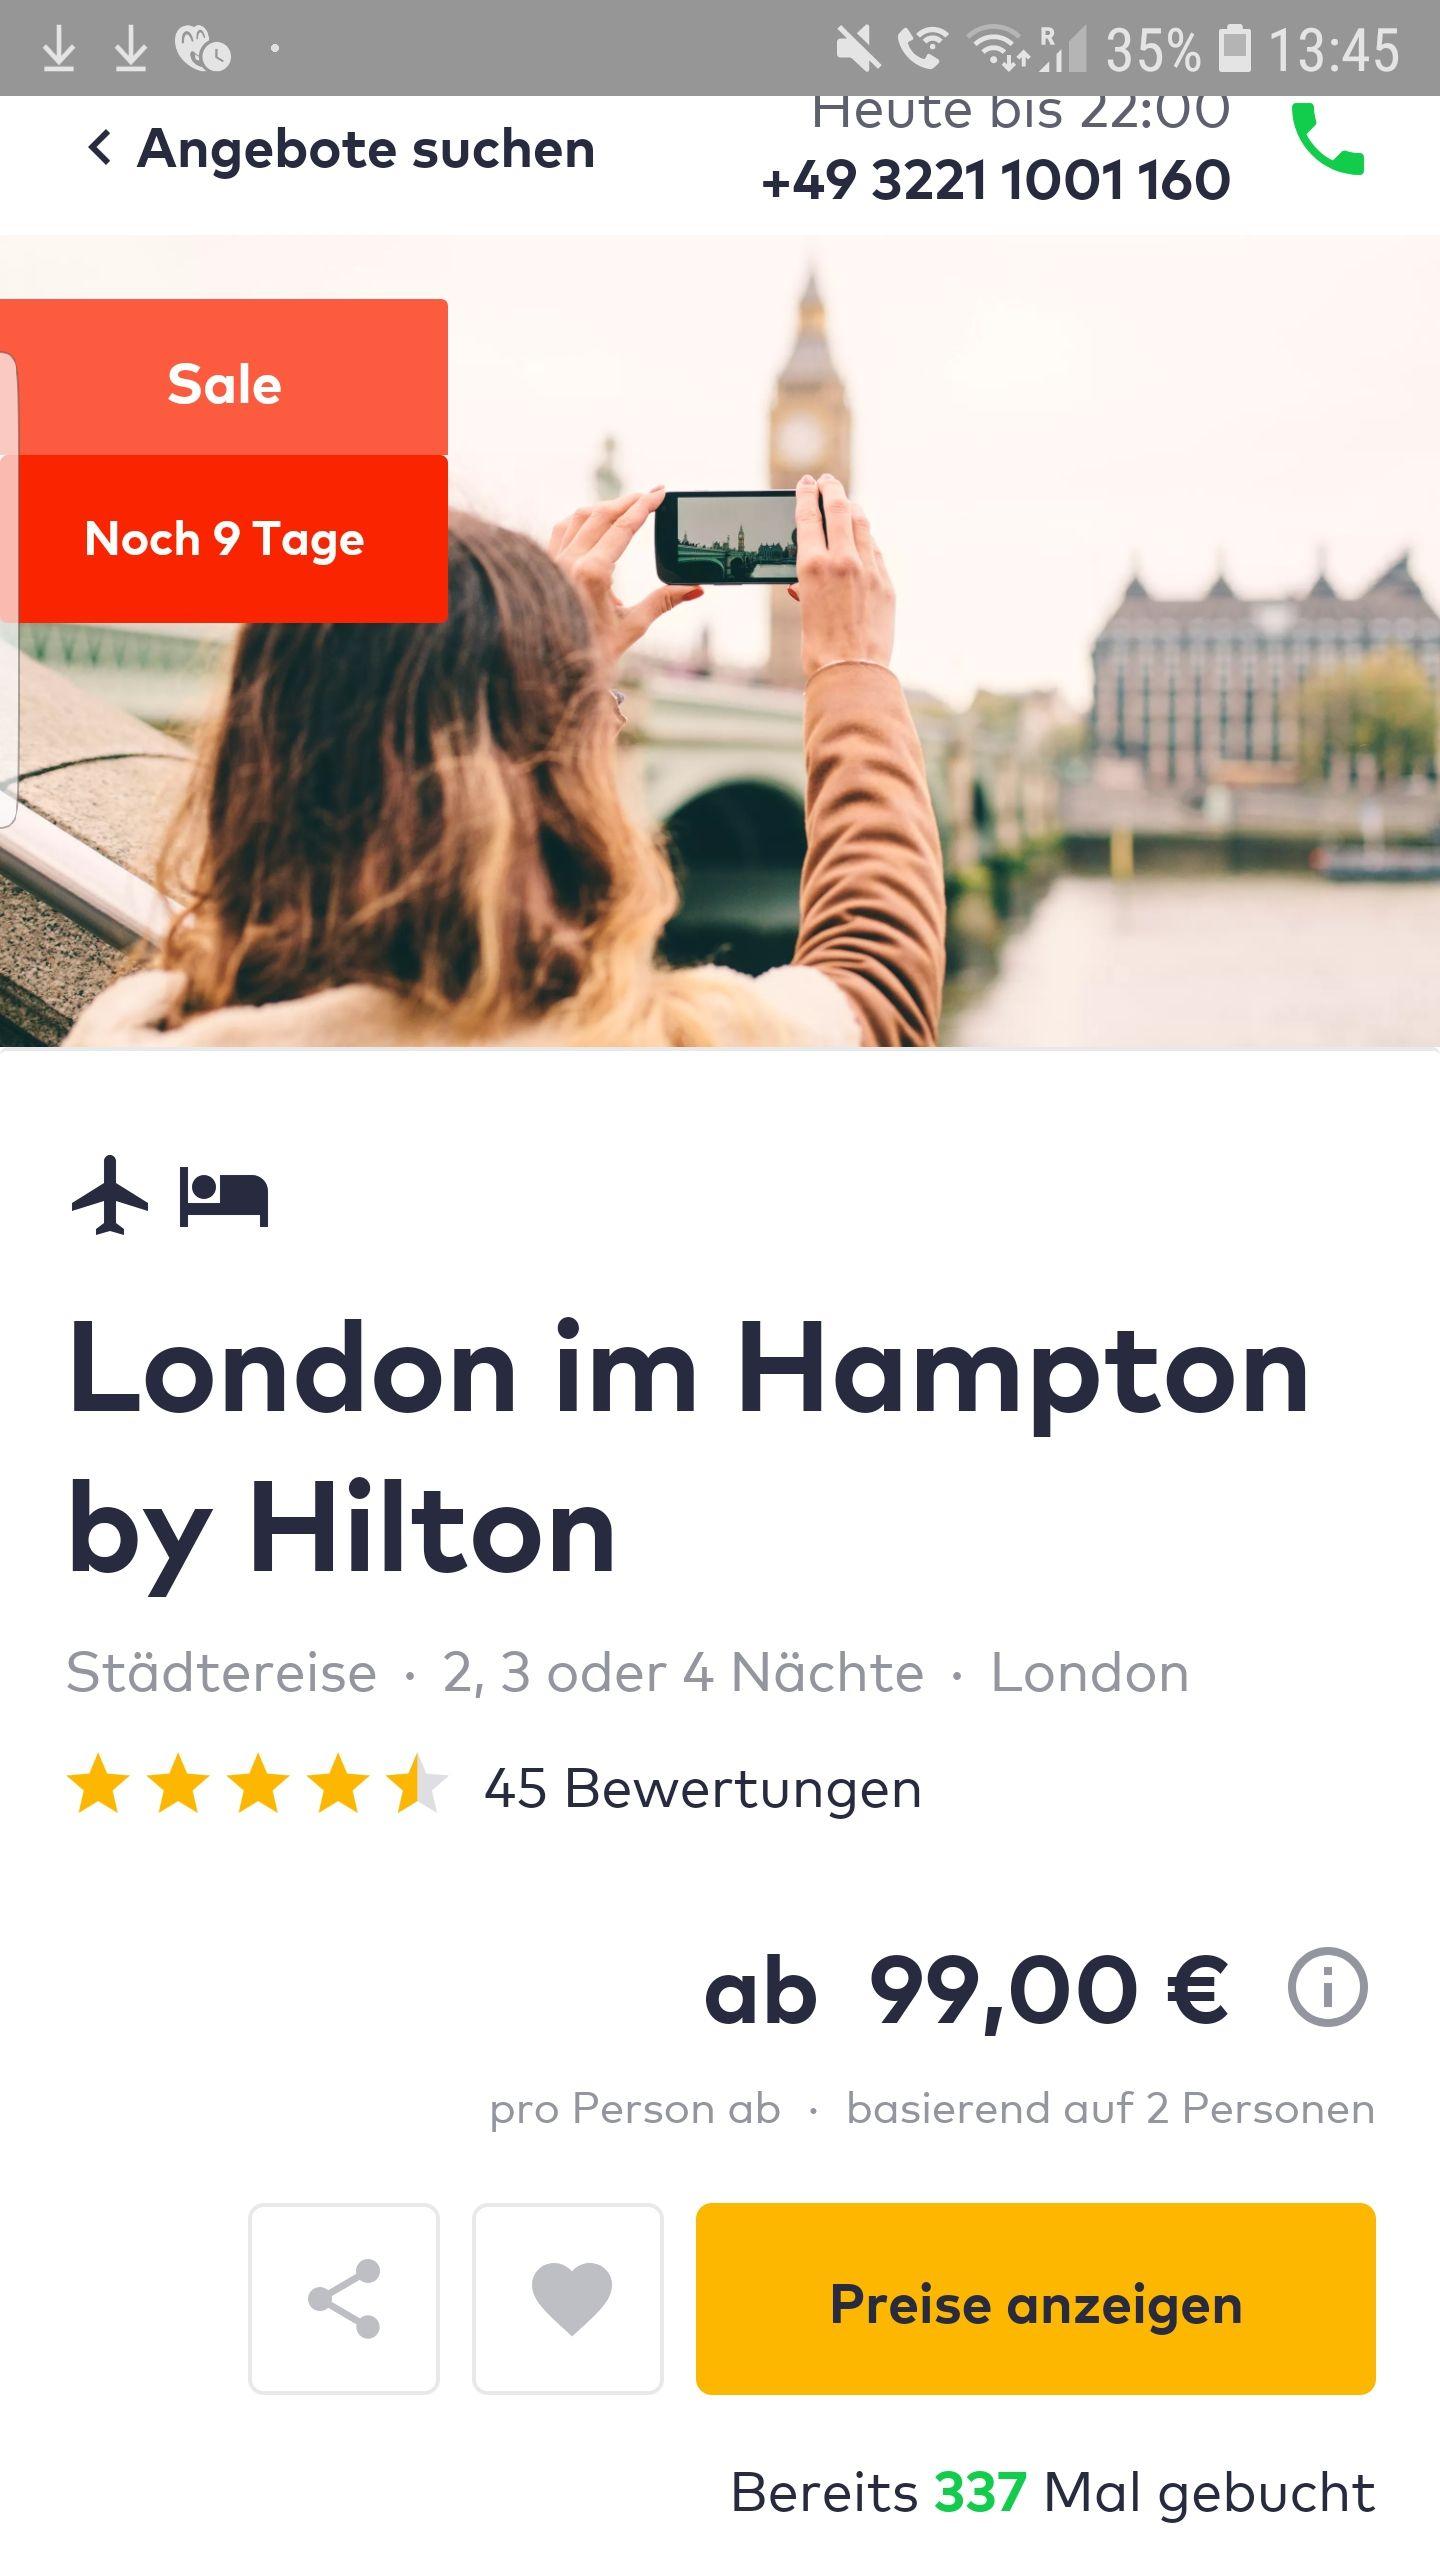 Kurztrip London (2 Personen)